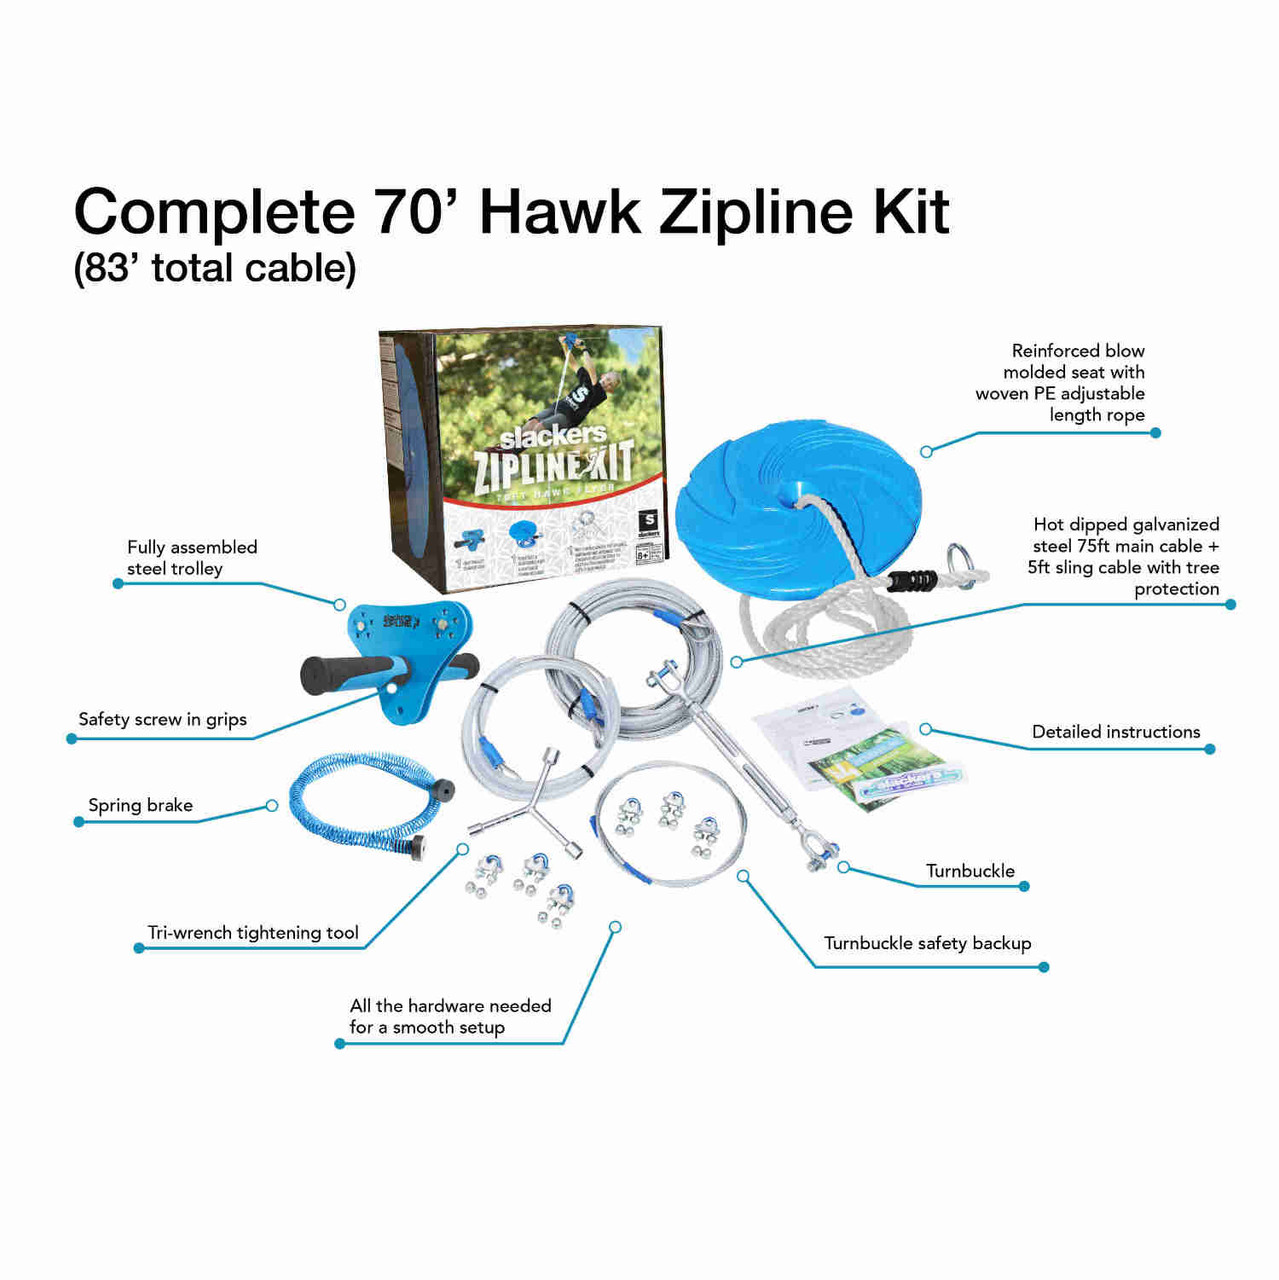 Slackers 70 ft Hawk Zipline Kit with contents explained - SLA-513